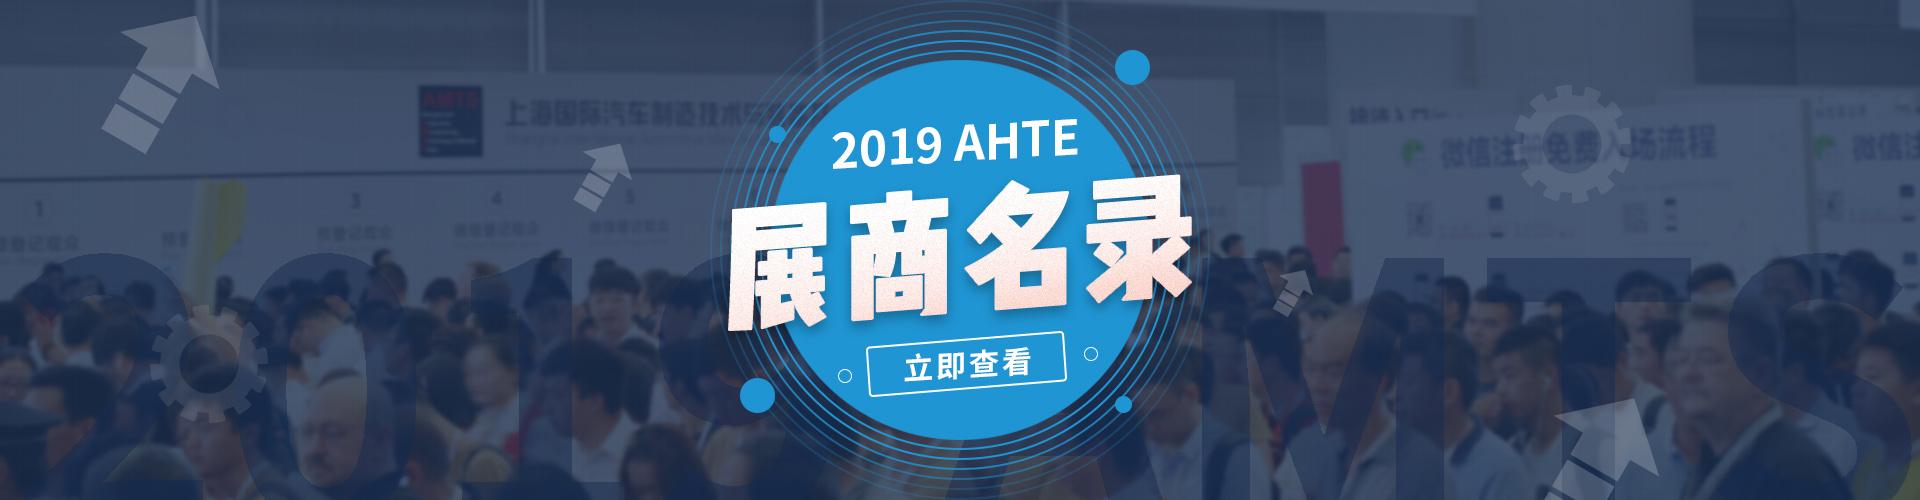 AHTE 2019 展商名录